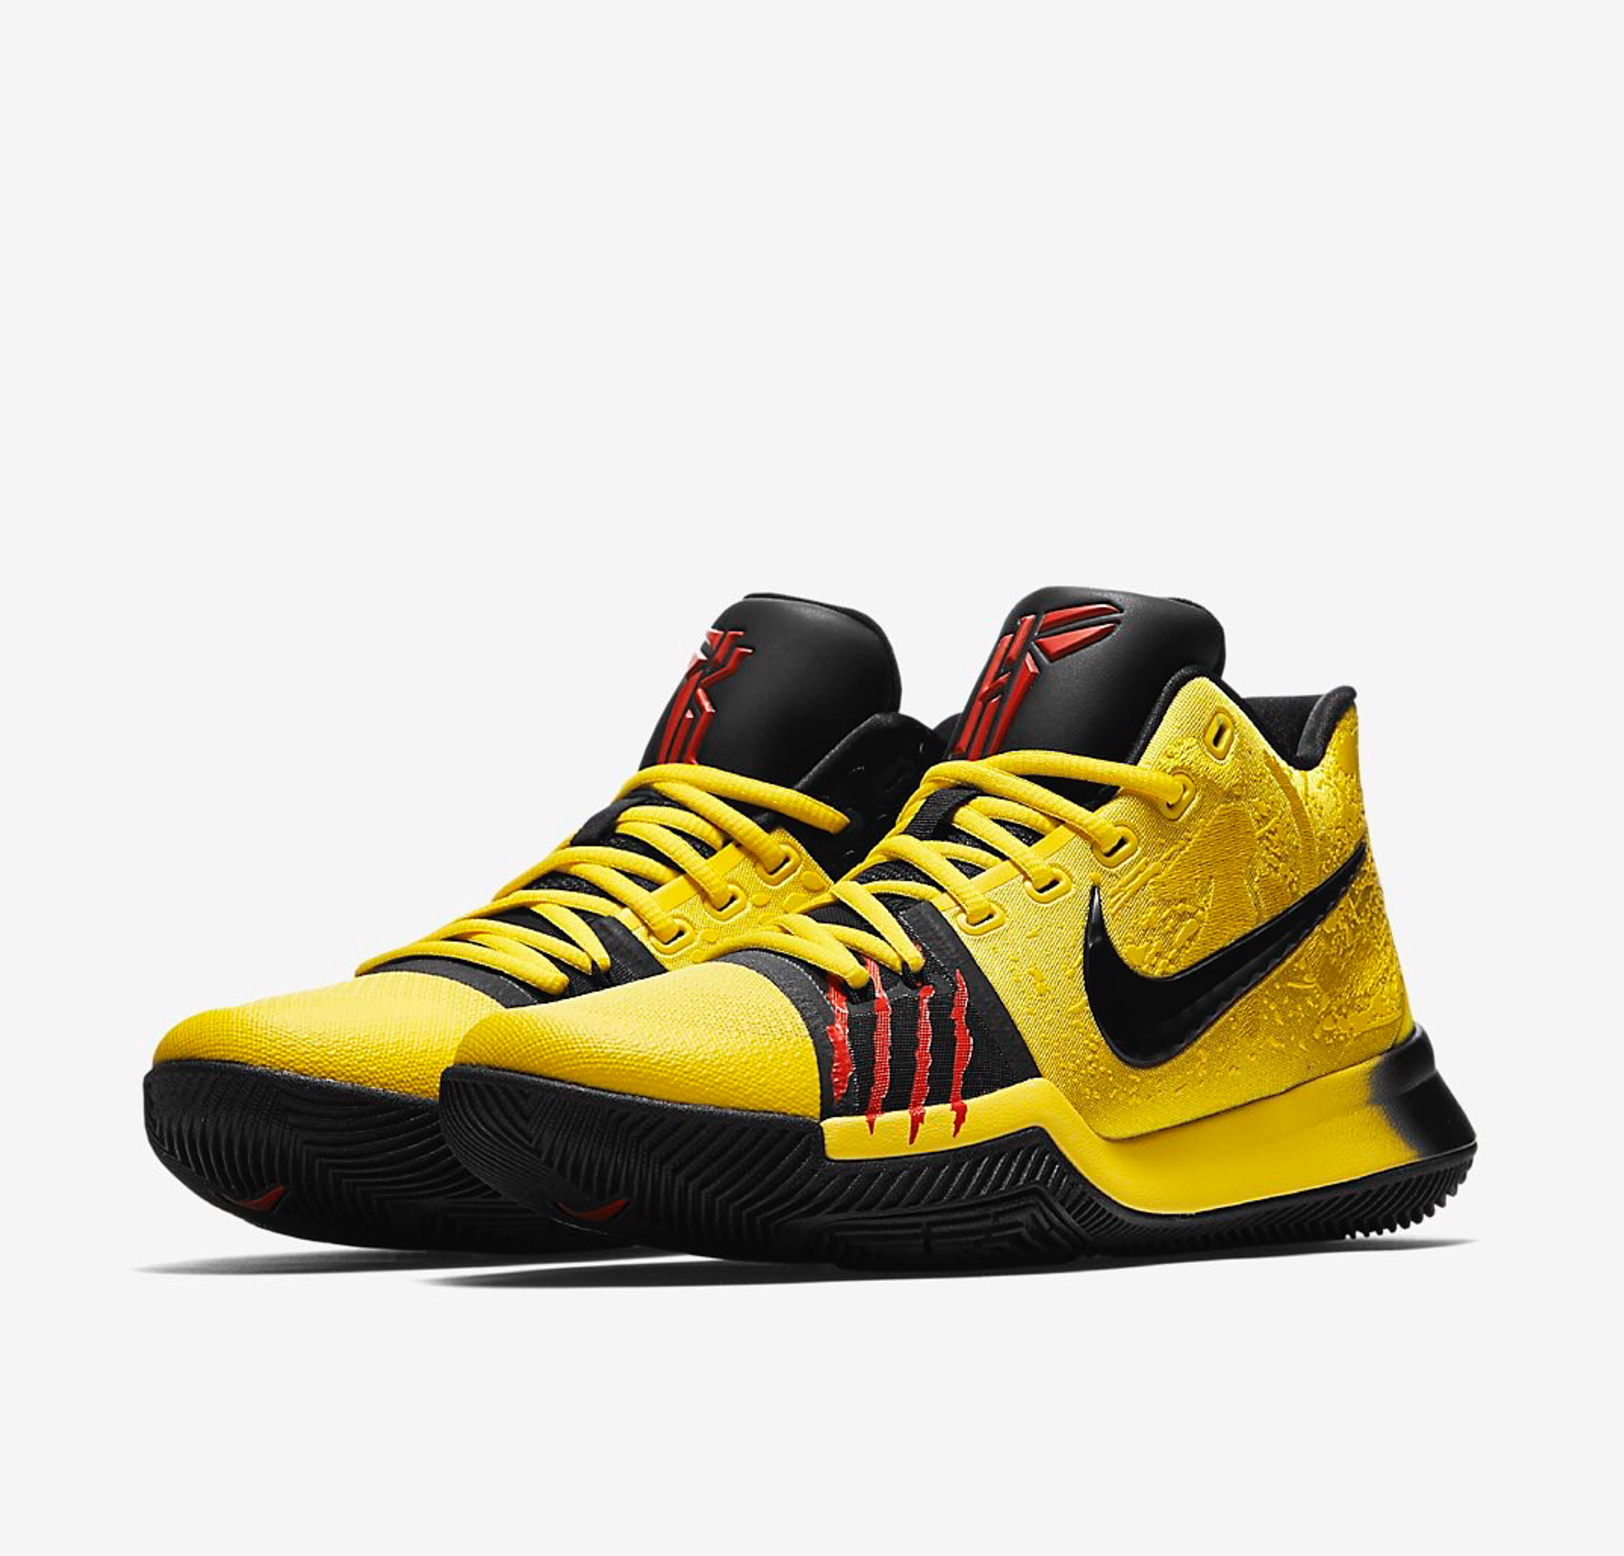 Nike Kyrie 3 MM 'Bruce Lee' - WearTesters